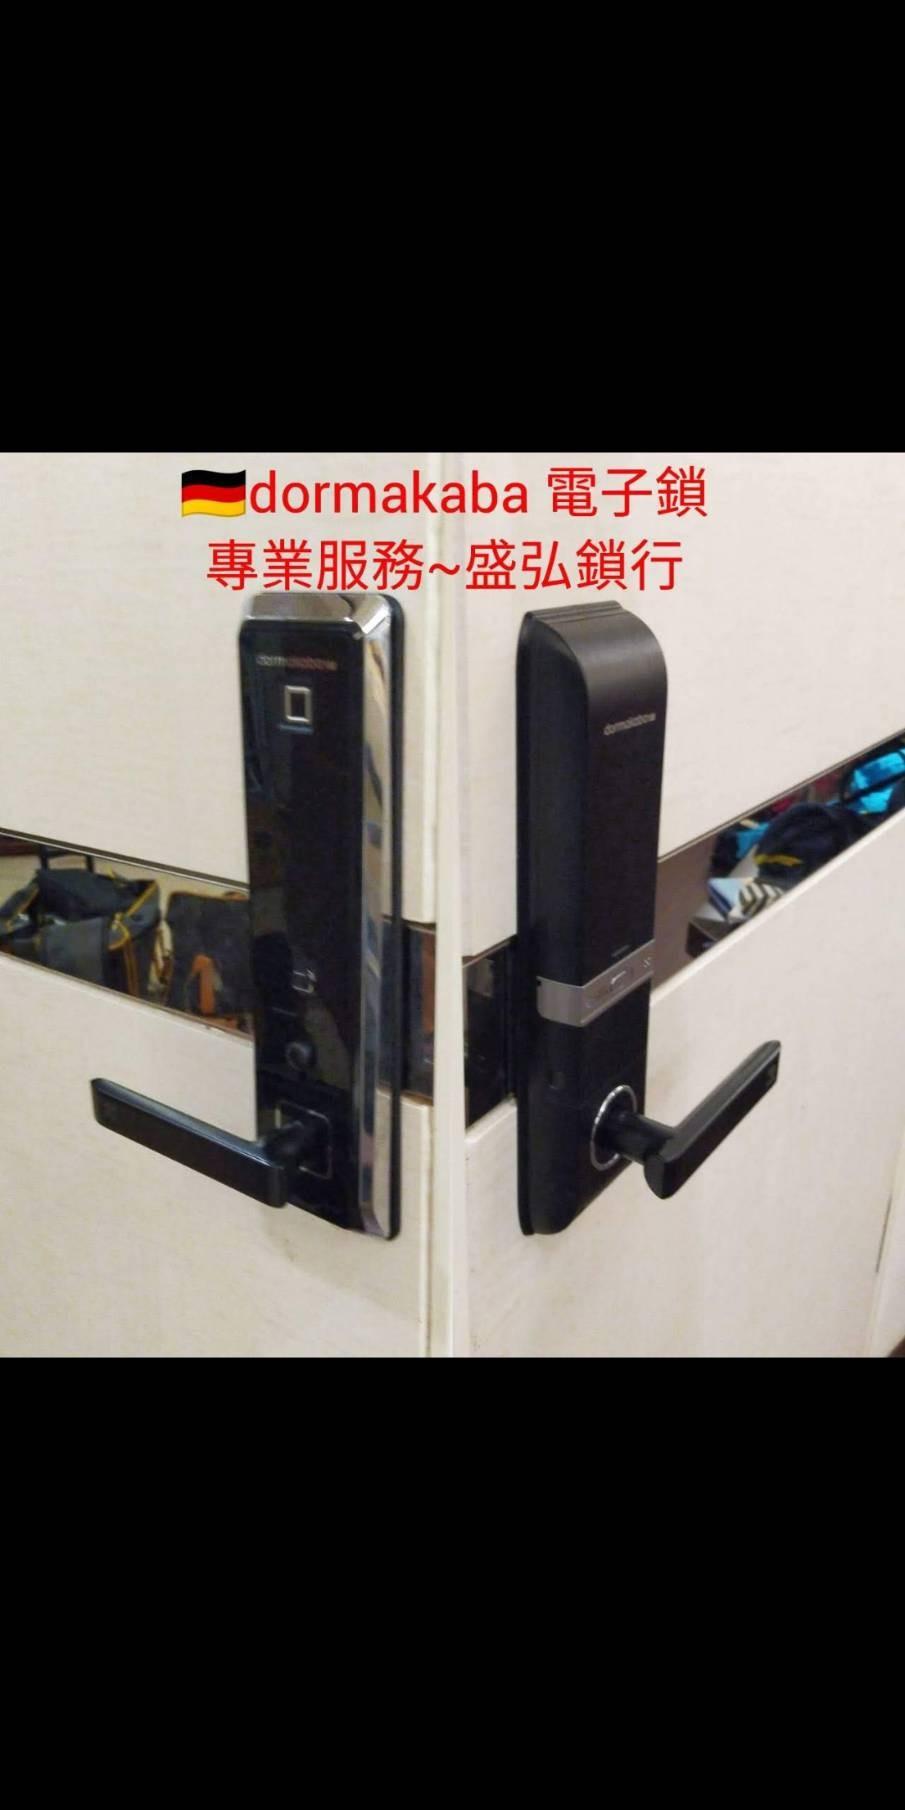 dormakaba電子鎖ML-550